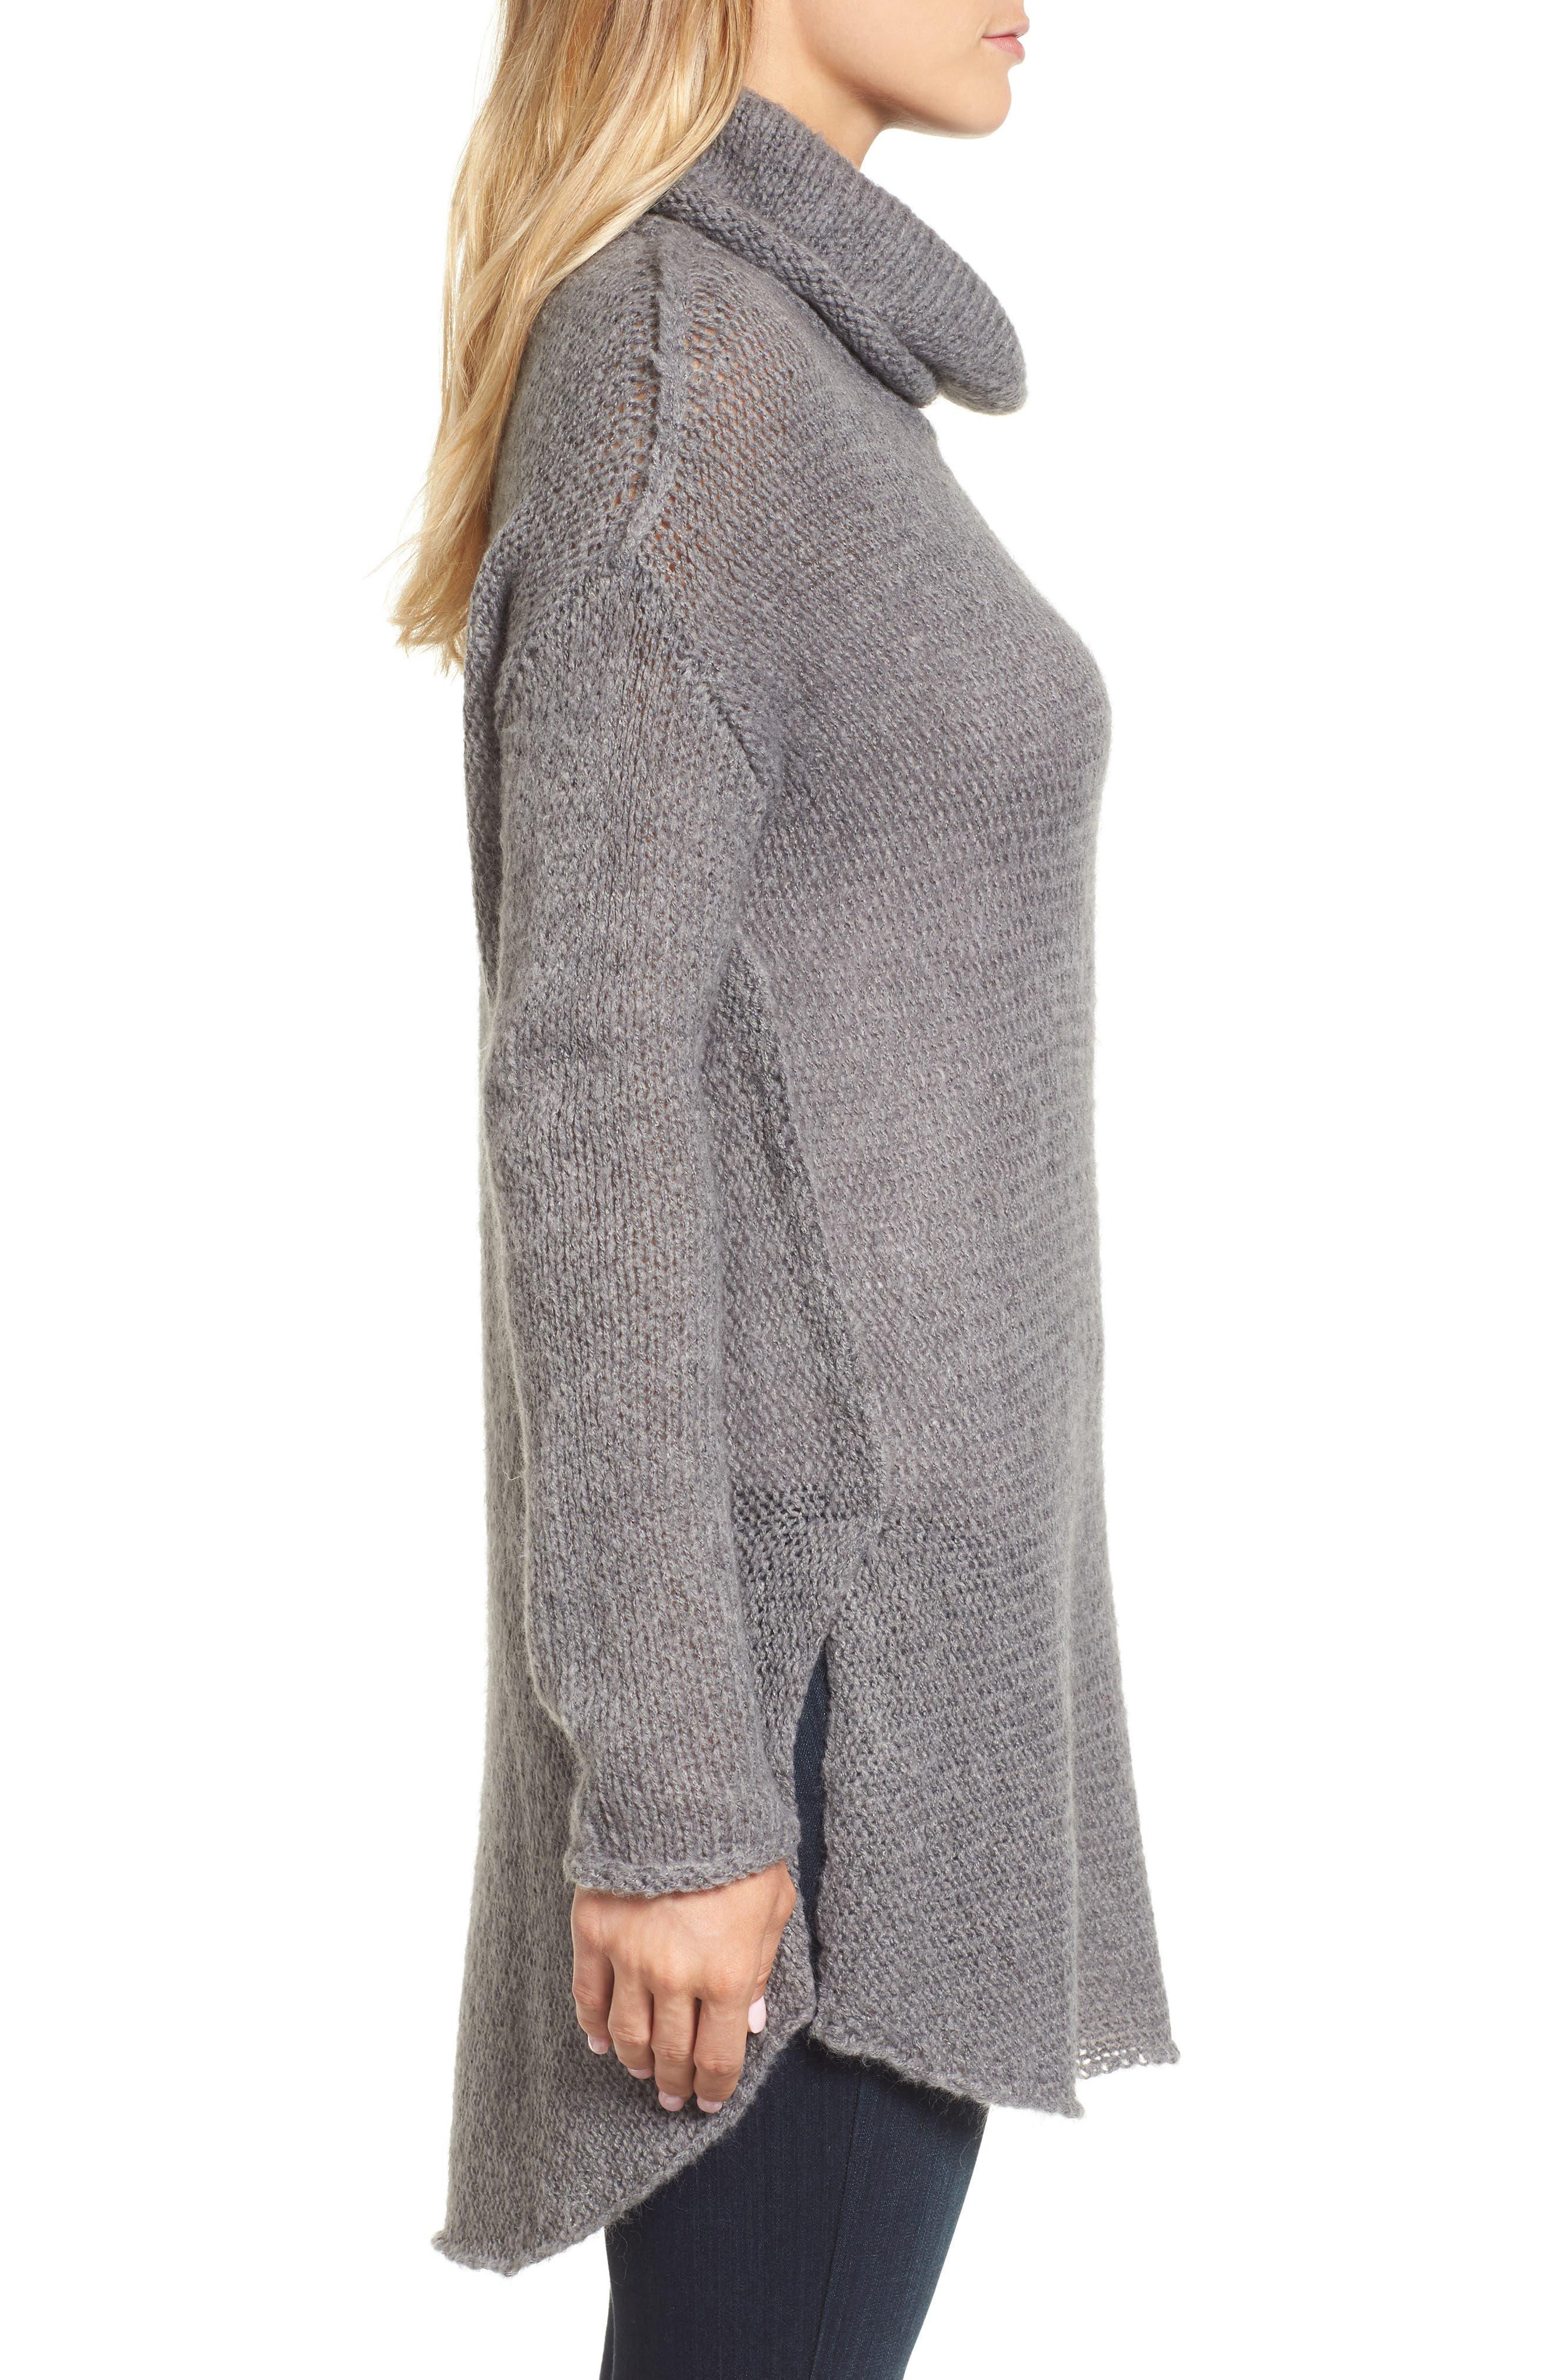 Tunic Sweater,                             Alternate thumbnail 3, color,                             GREY DARK HEATHER